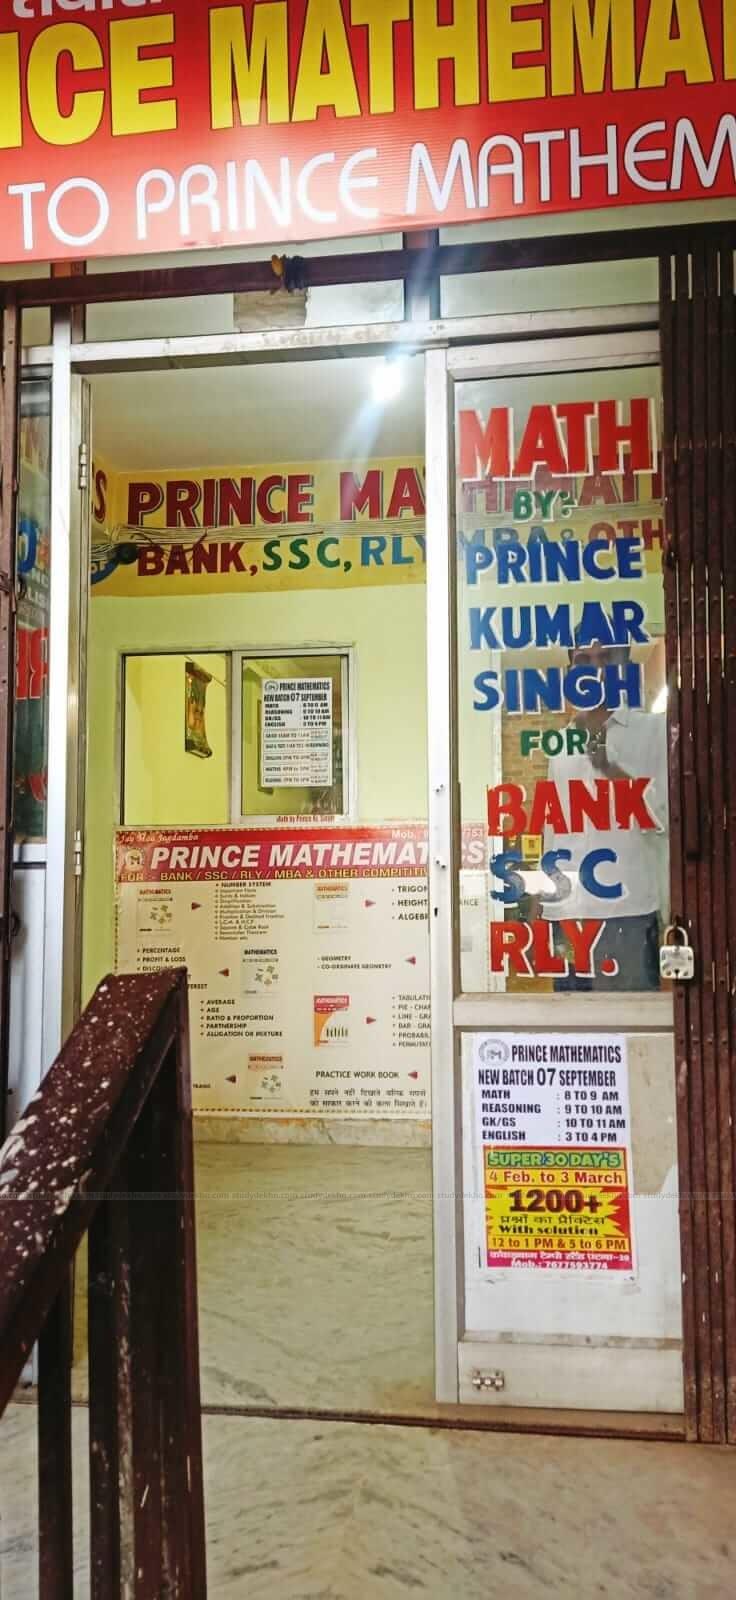 Prince Mathematics Logo